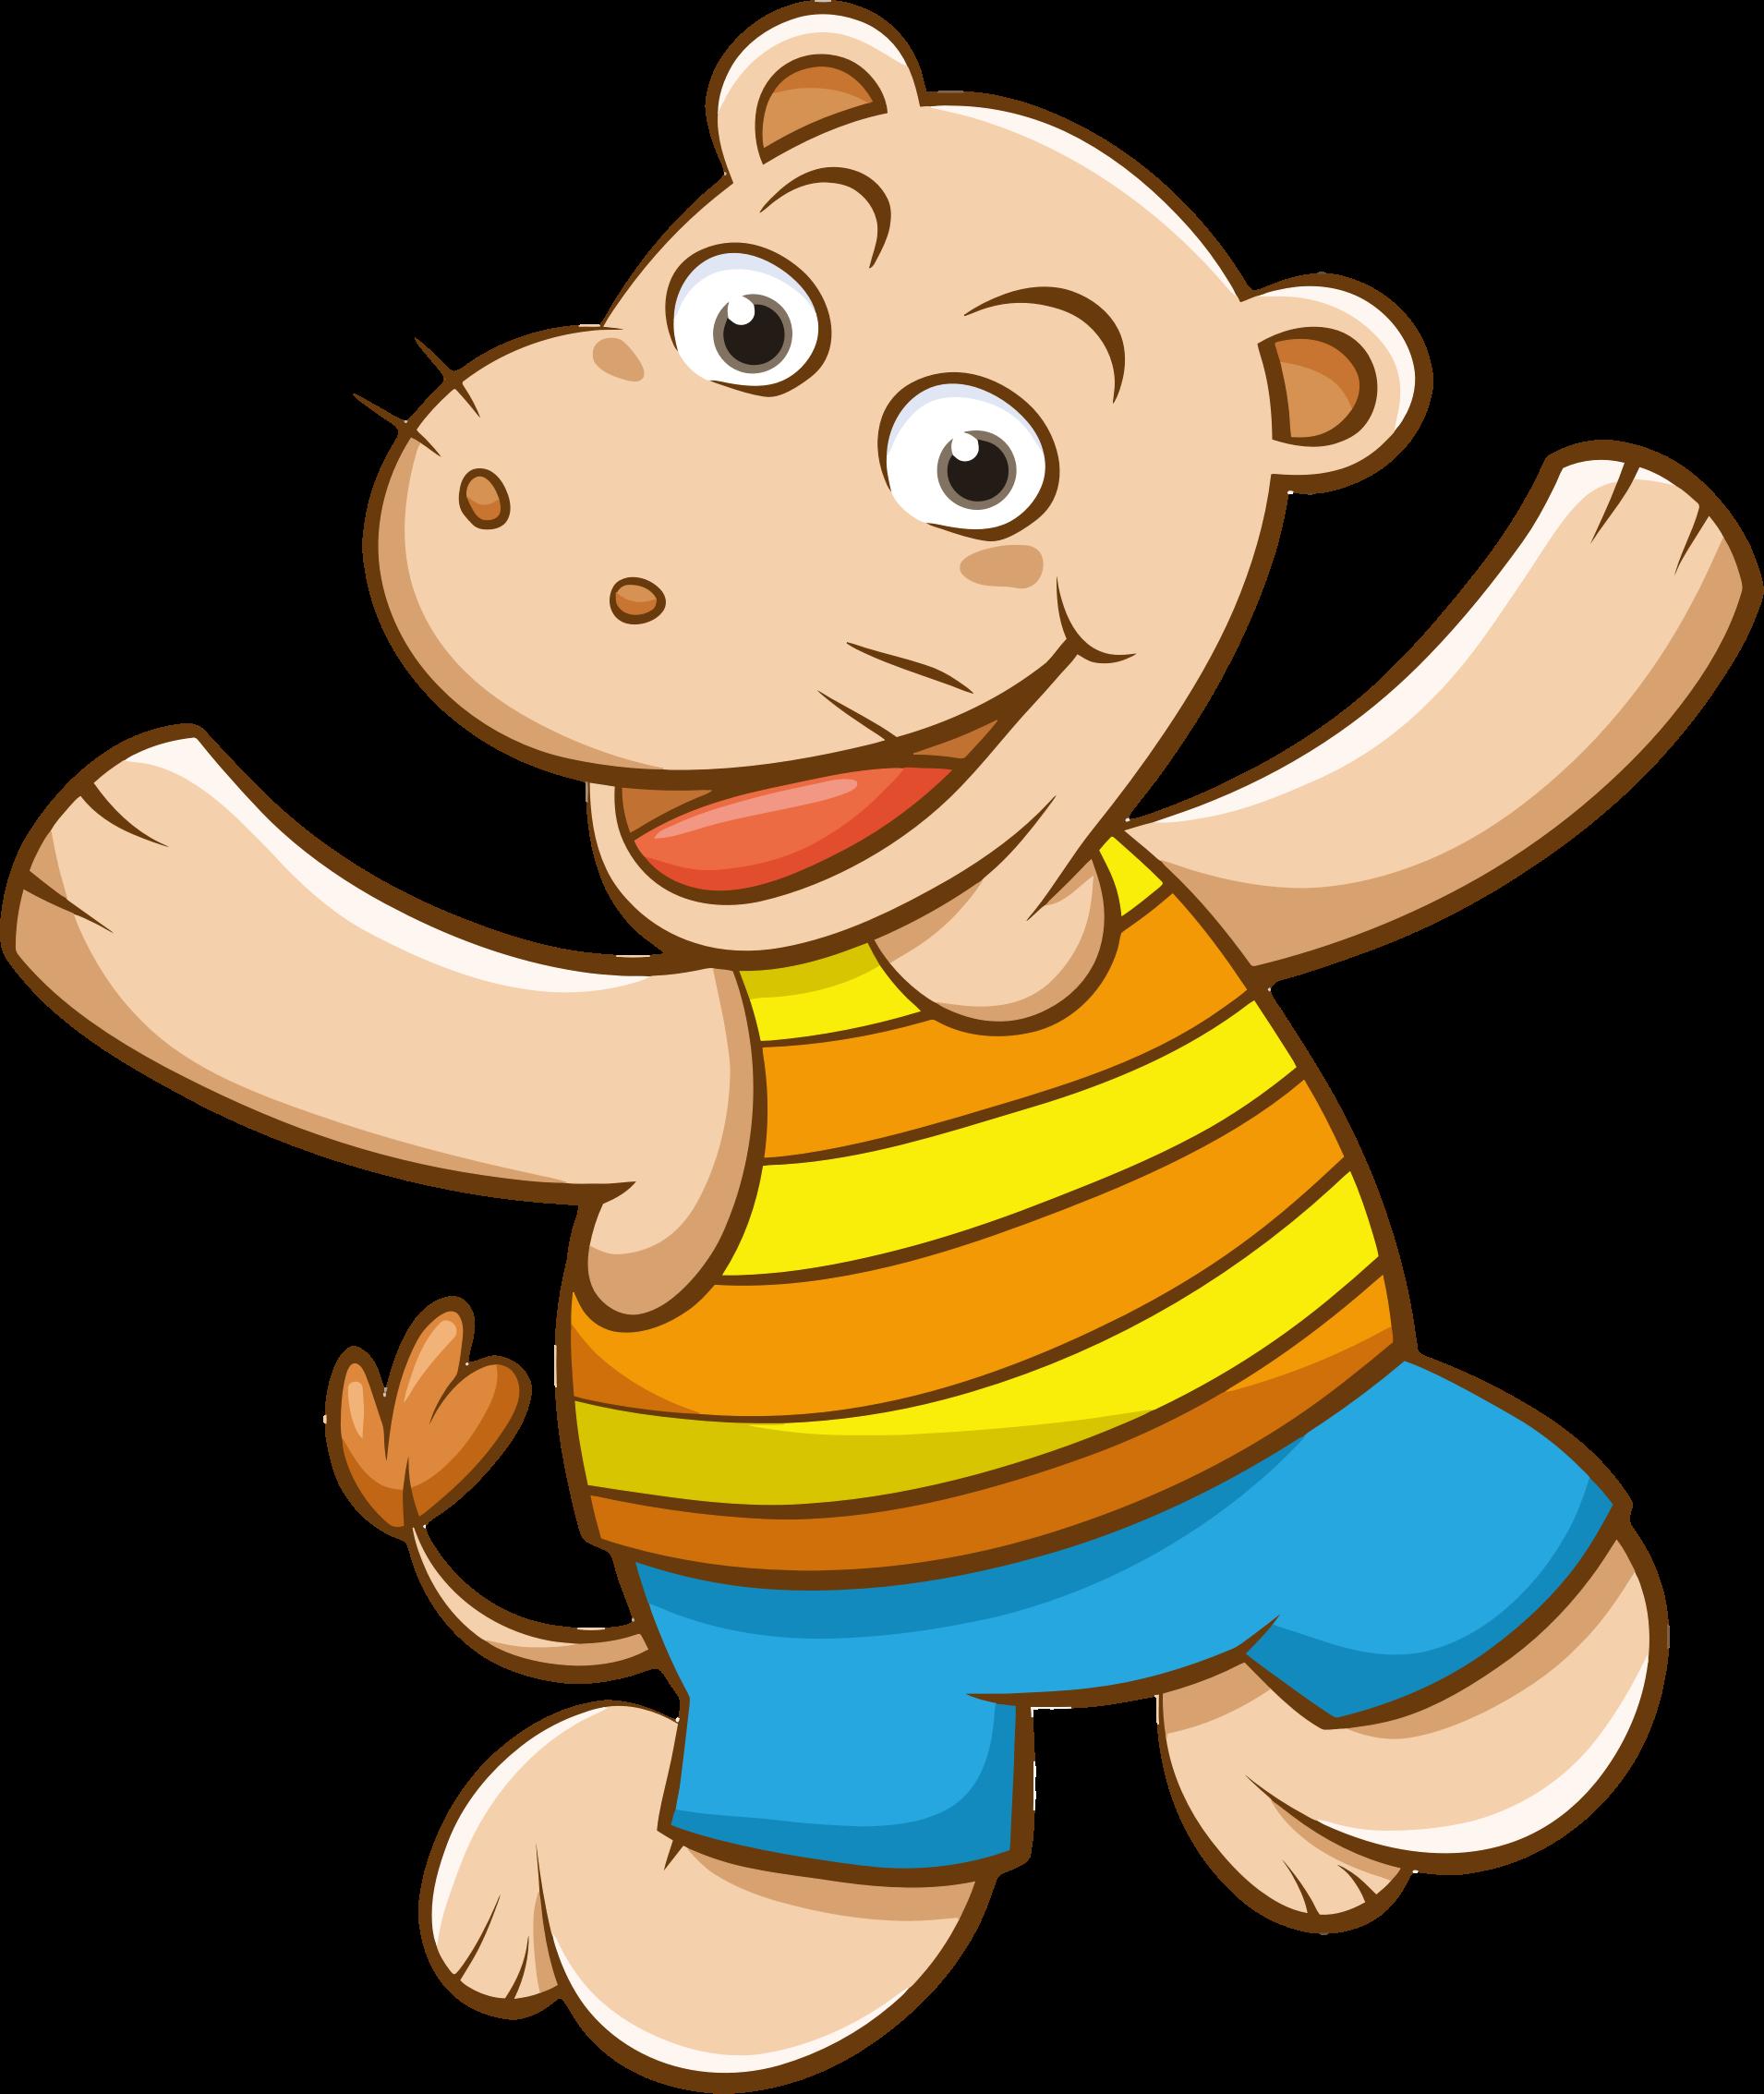 Hippo clipart cartoon. Pinterest